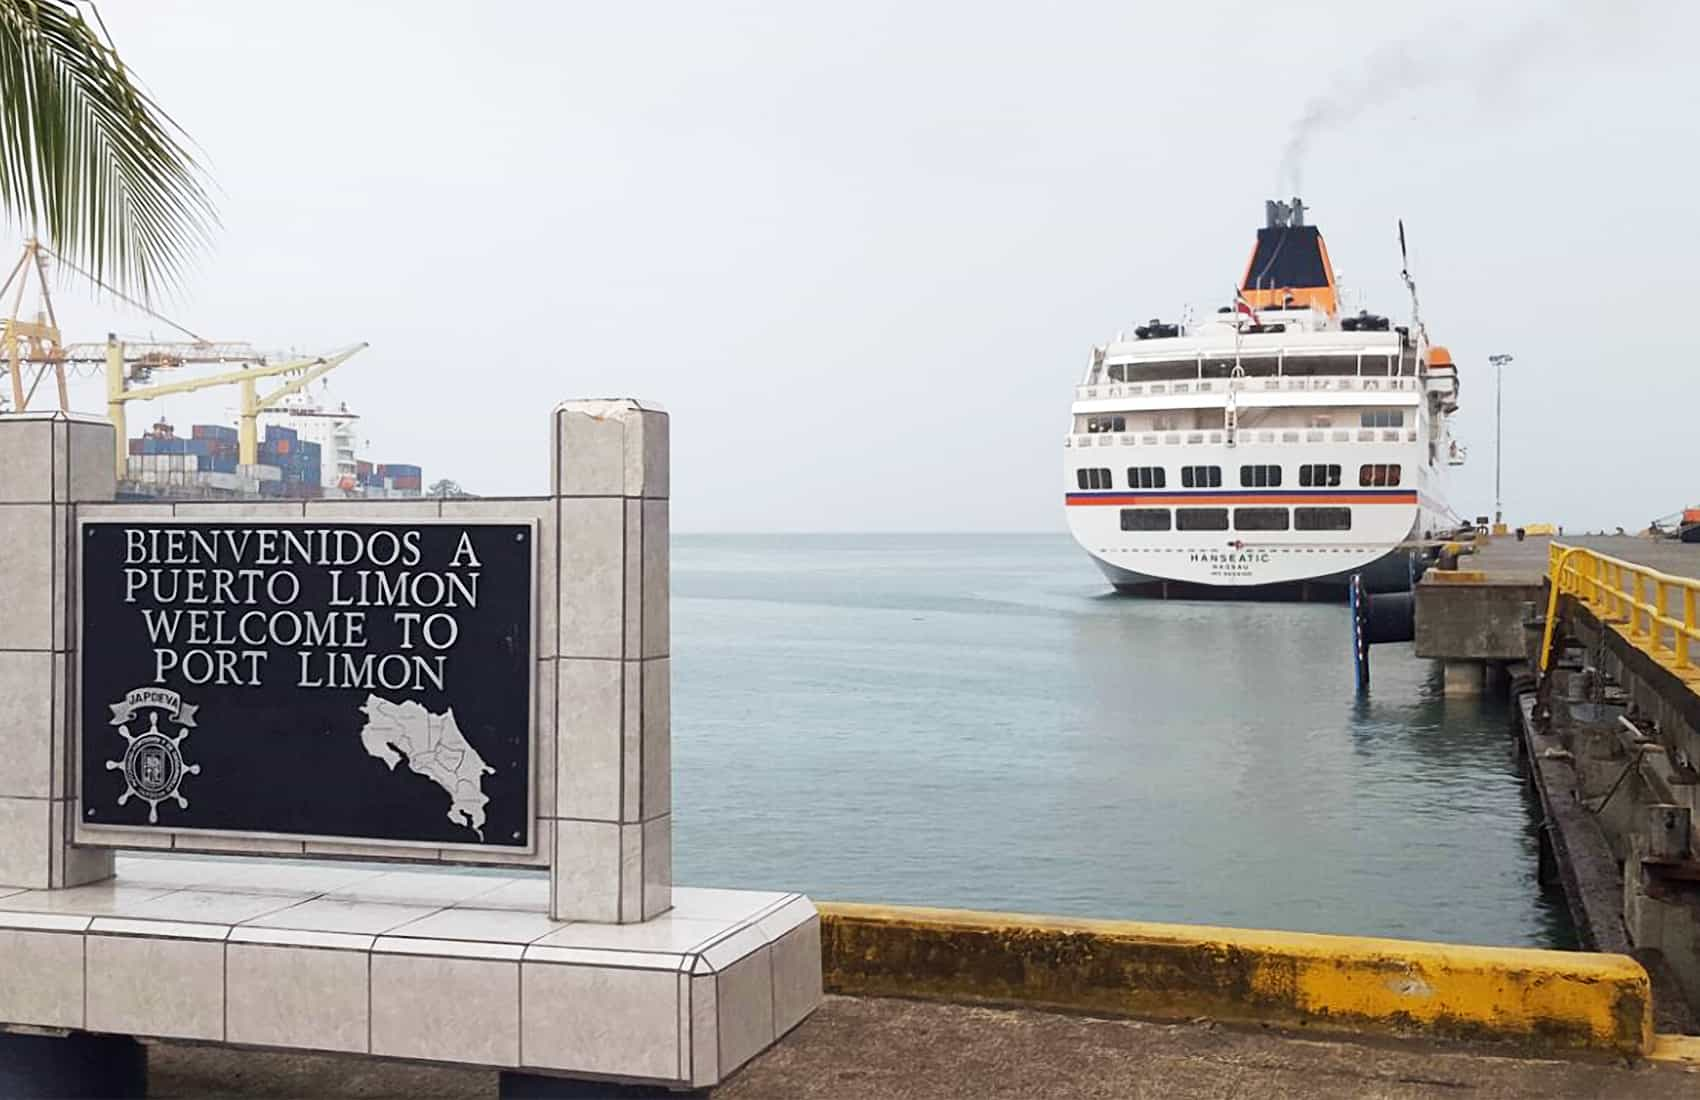 Hanseatic cruise ship at Limón dock. May 13, 2016.